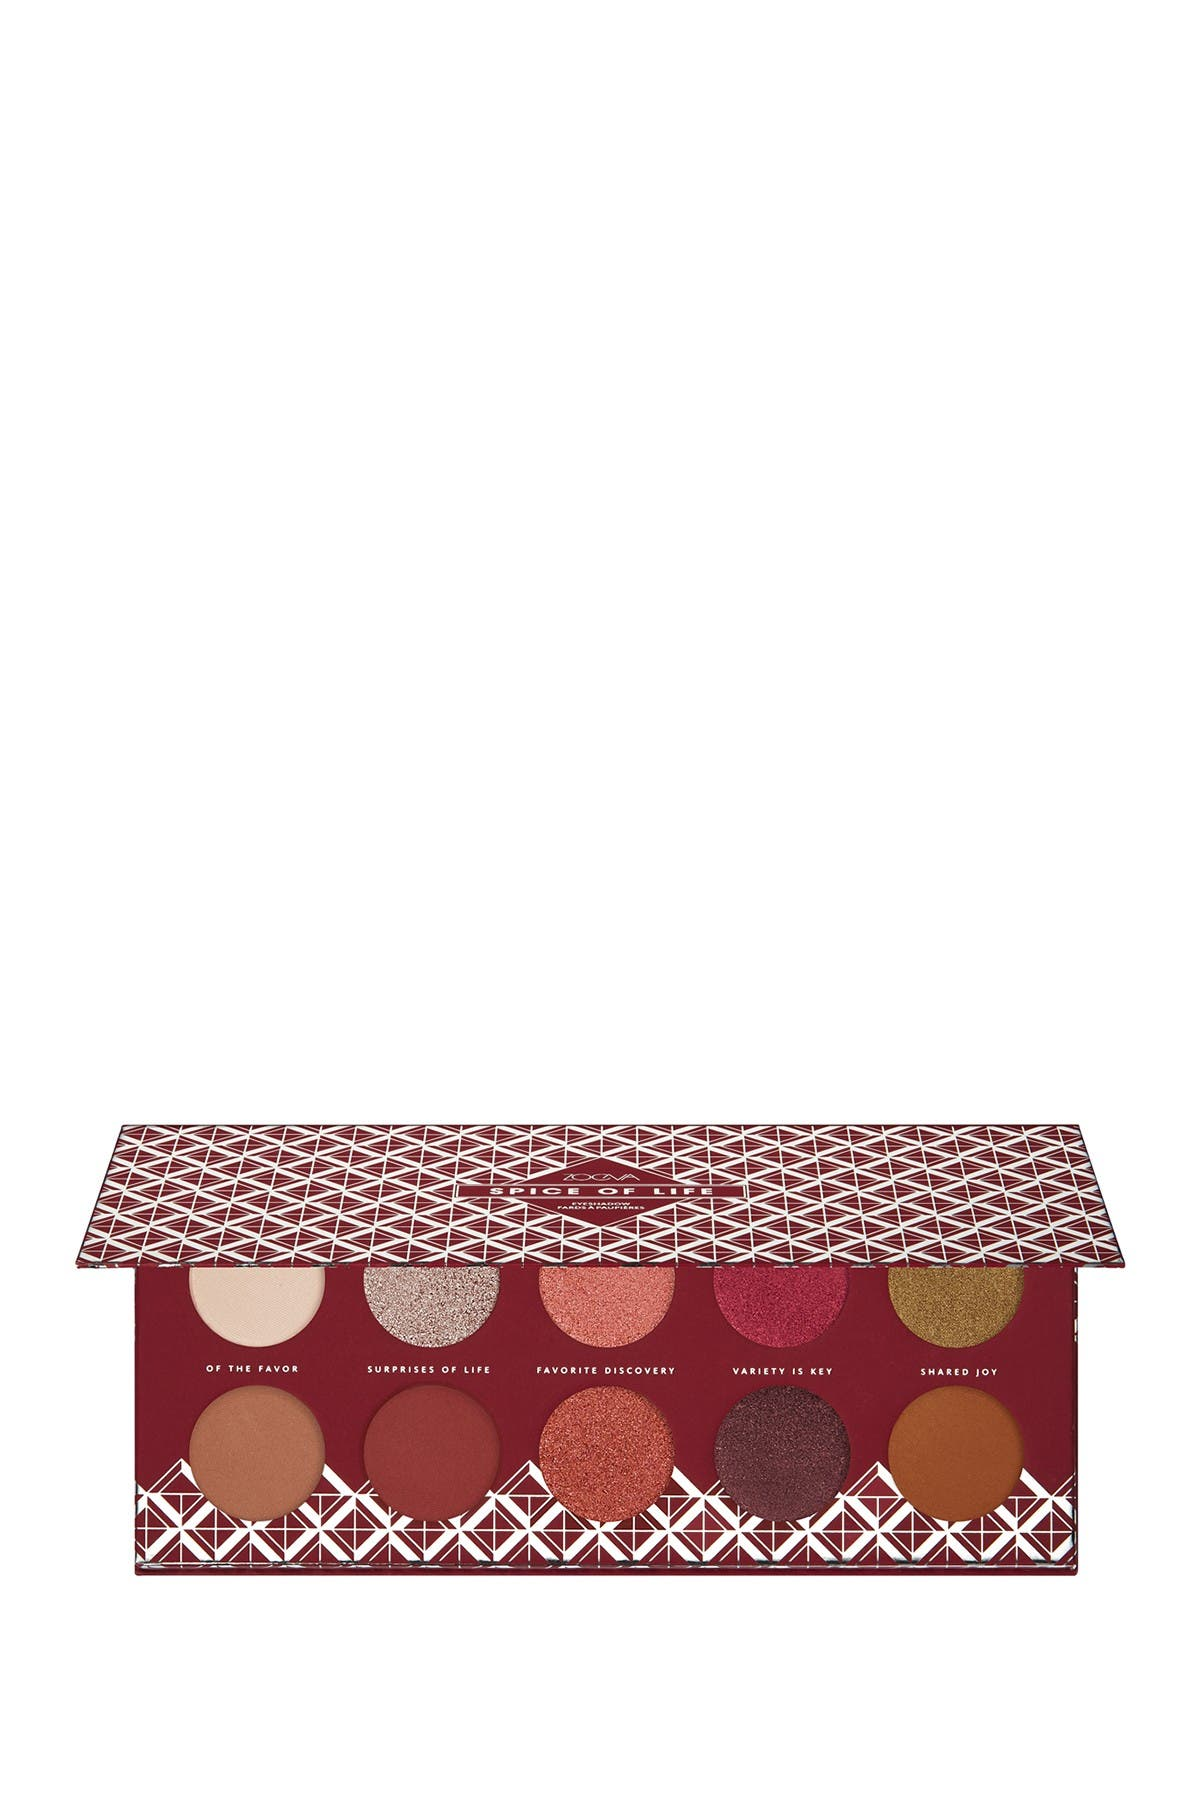 Image of Zoeva Spice Of Life Eyeshadow Palette